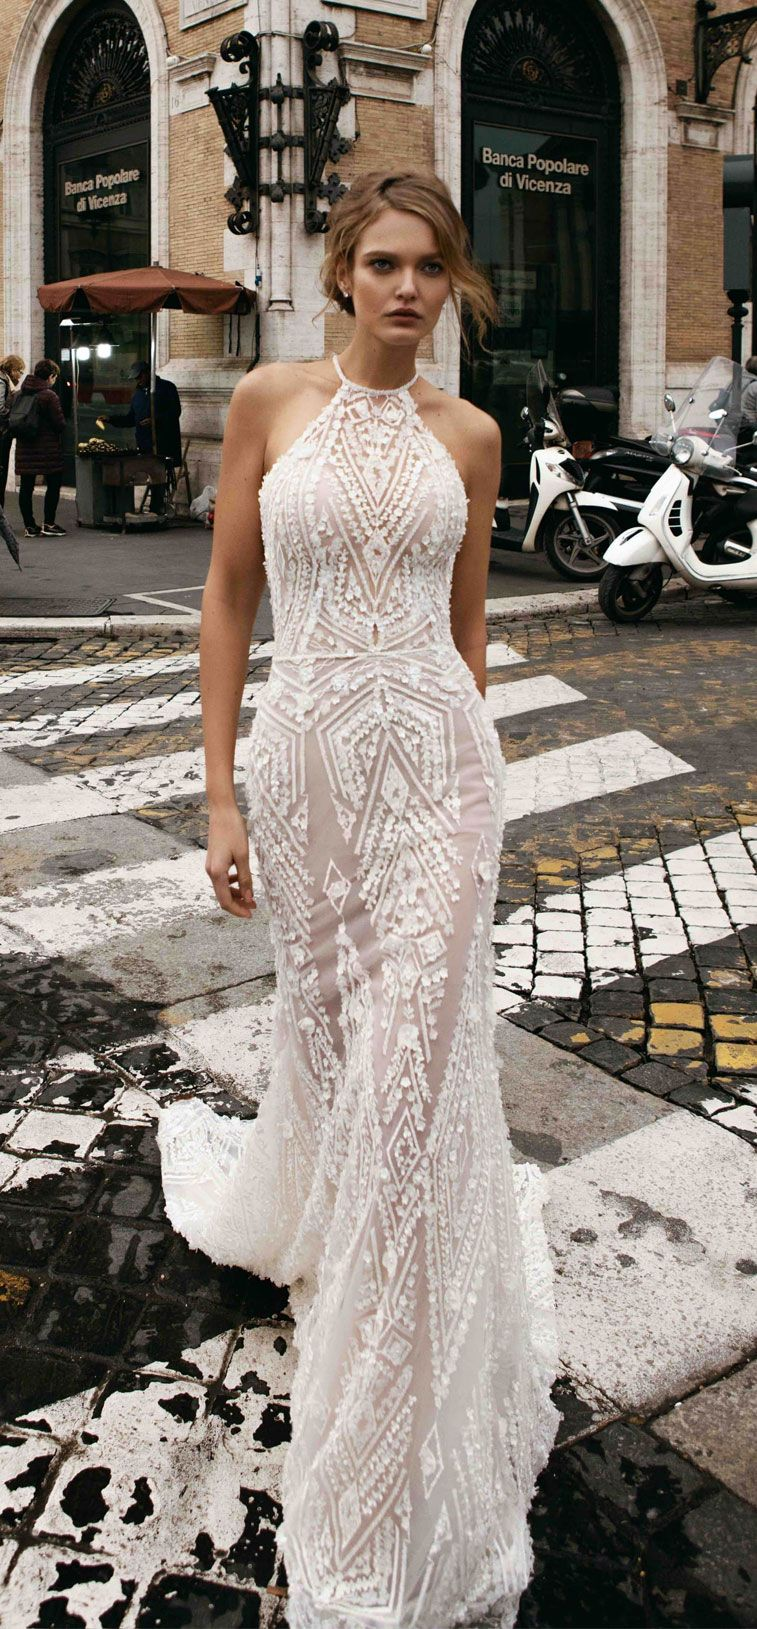 Sleeveless halter neck classic and Elegant full beaded embellishment Fit and Flare Wedding Dress ,mermaid wedding gown #wedding #weddings #weddingdresses #weddingdress